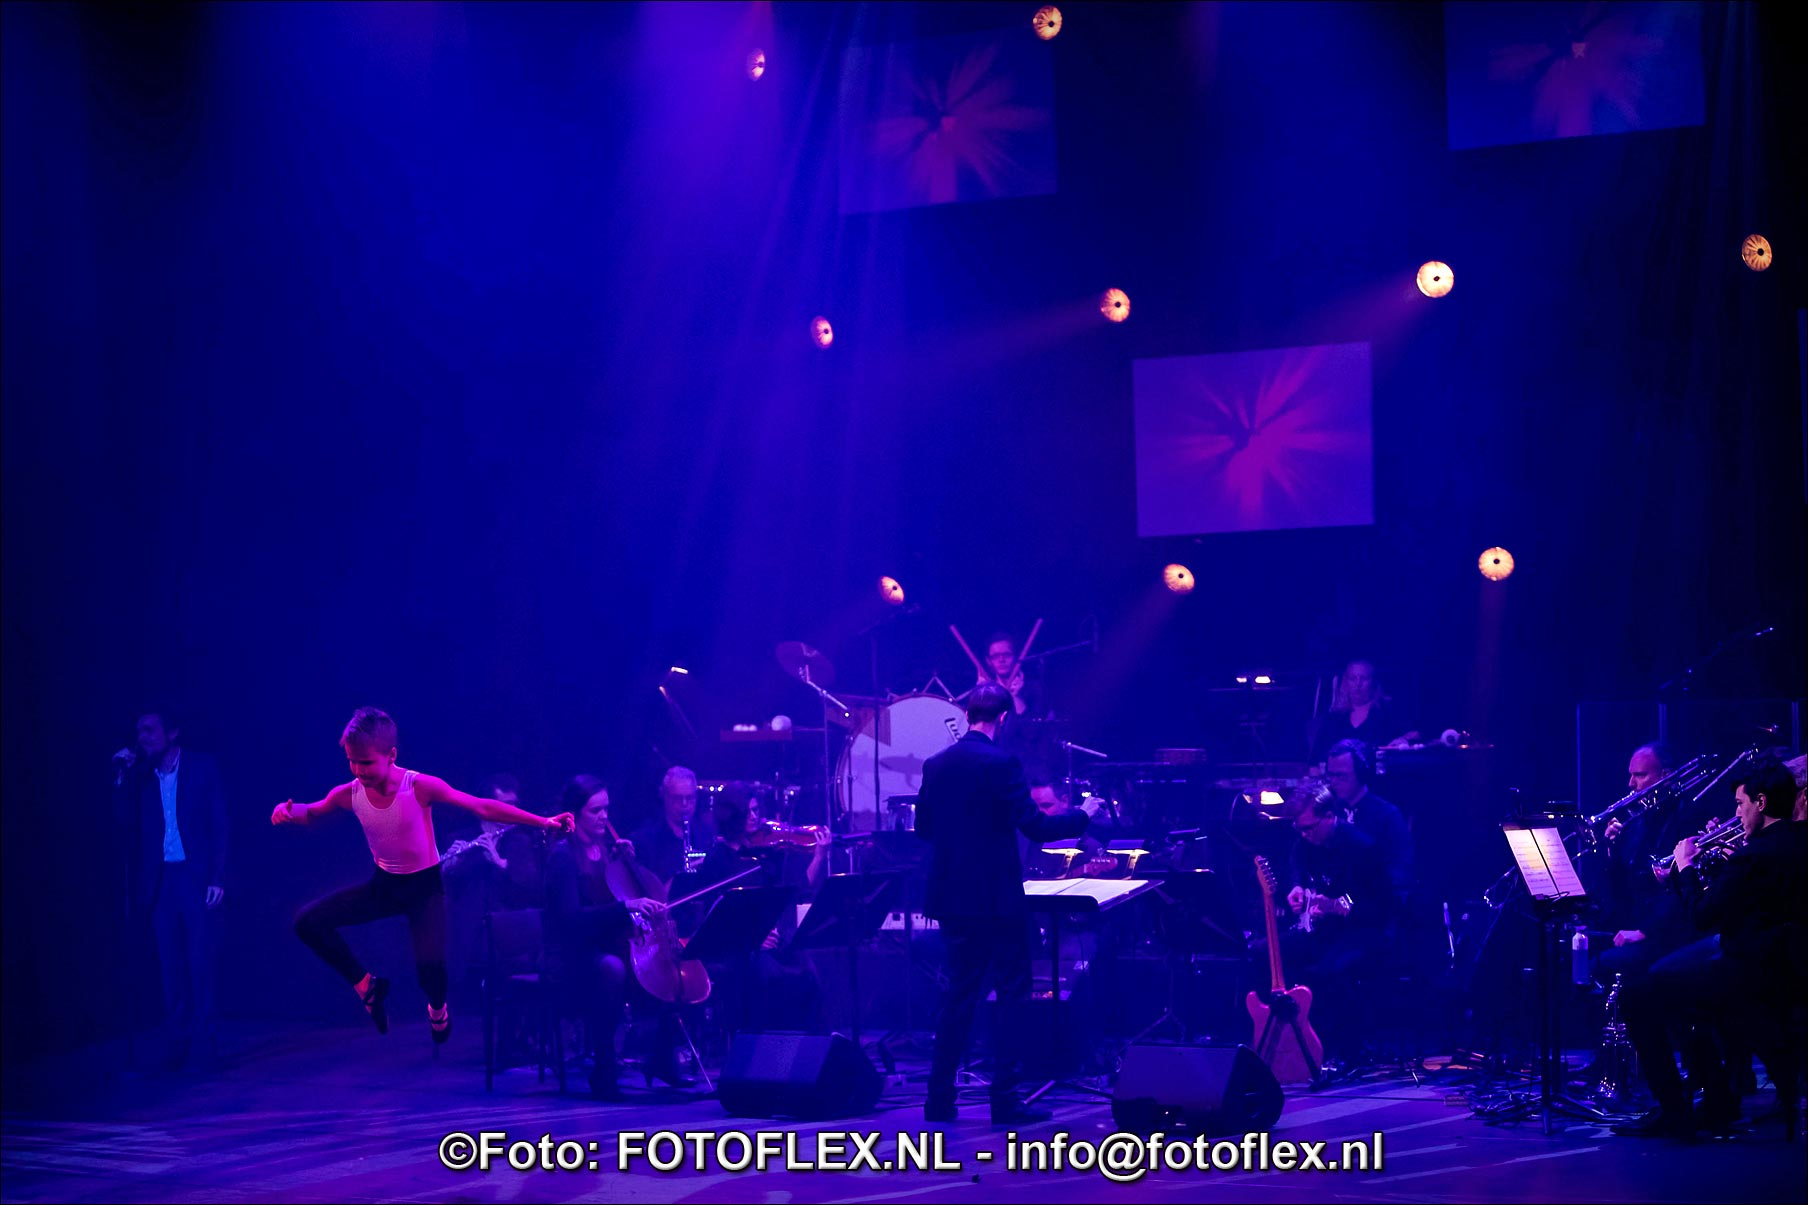 0449-CopyrightFOTOFLEX.NL07012020